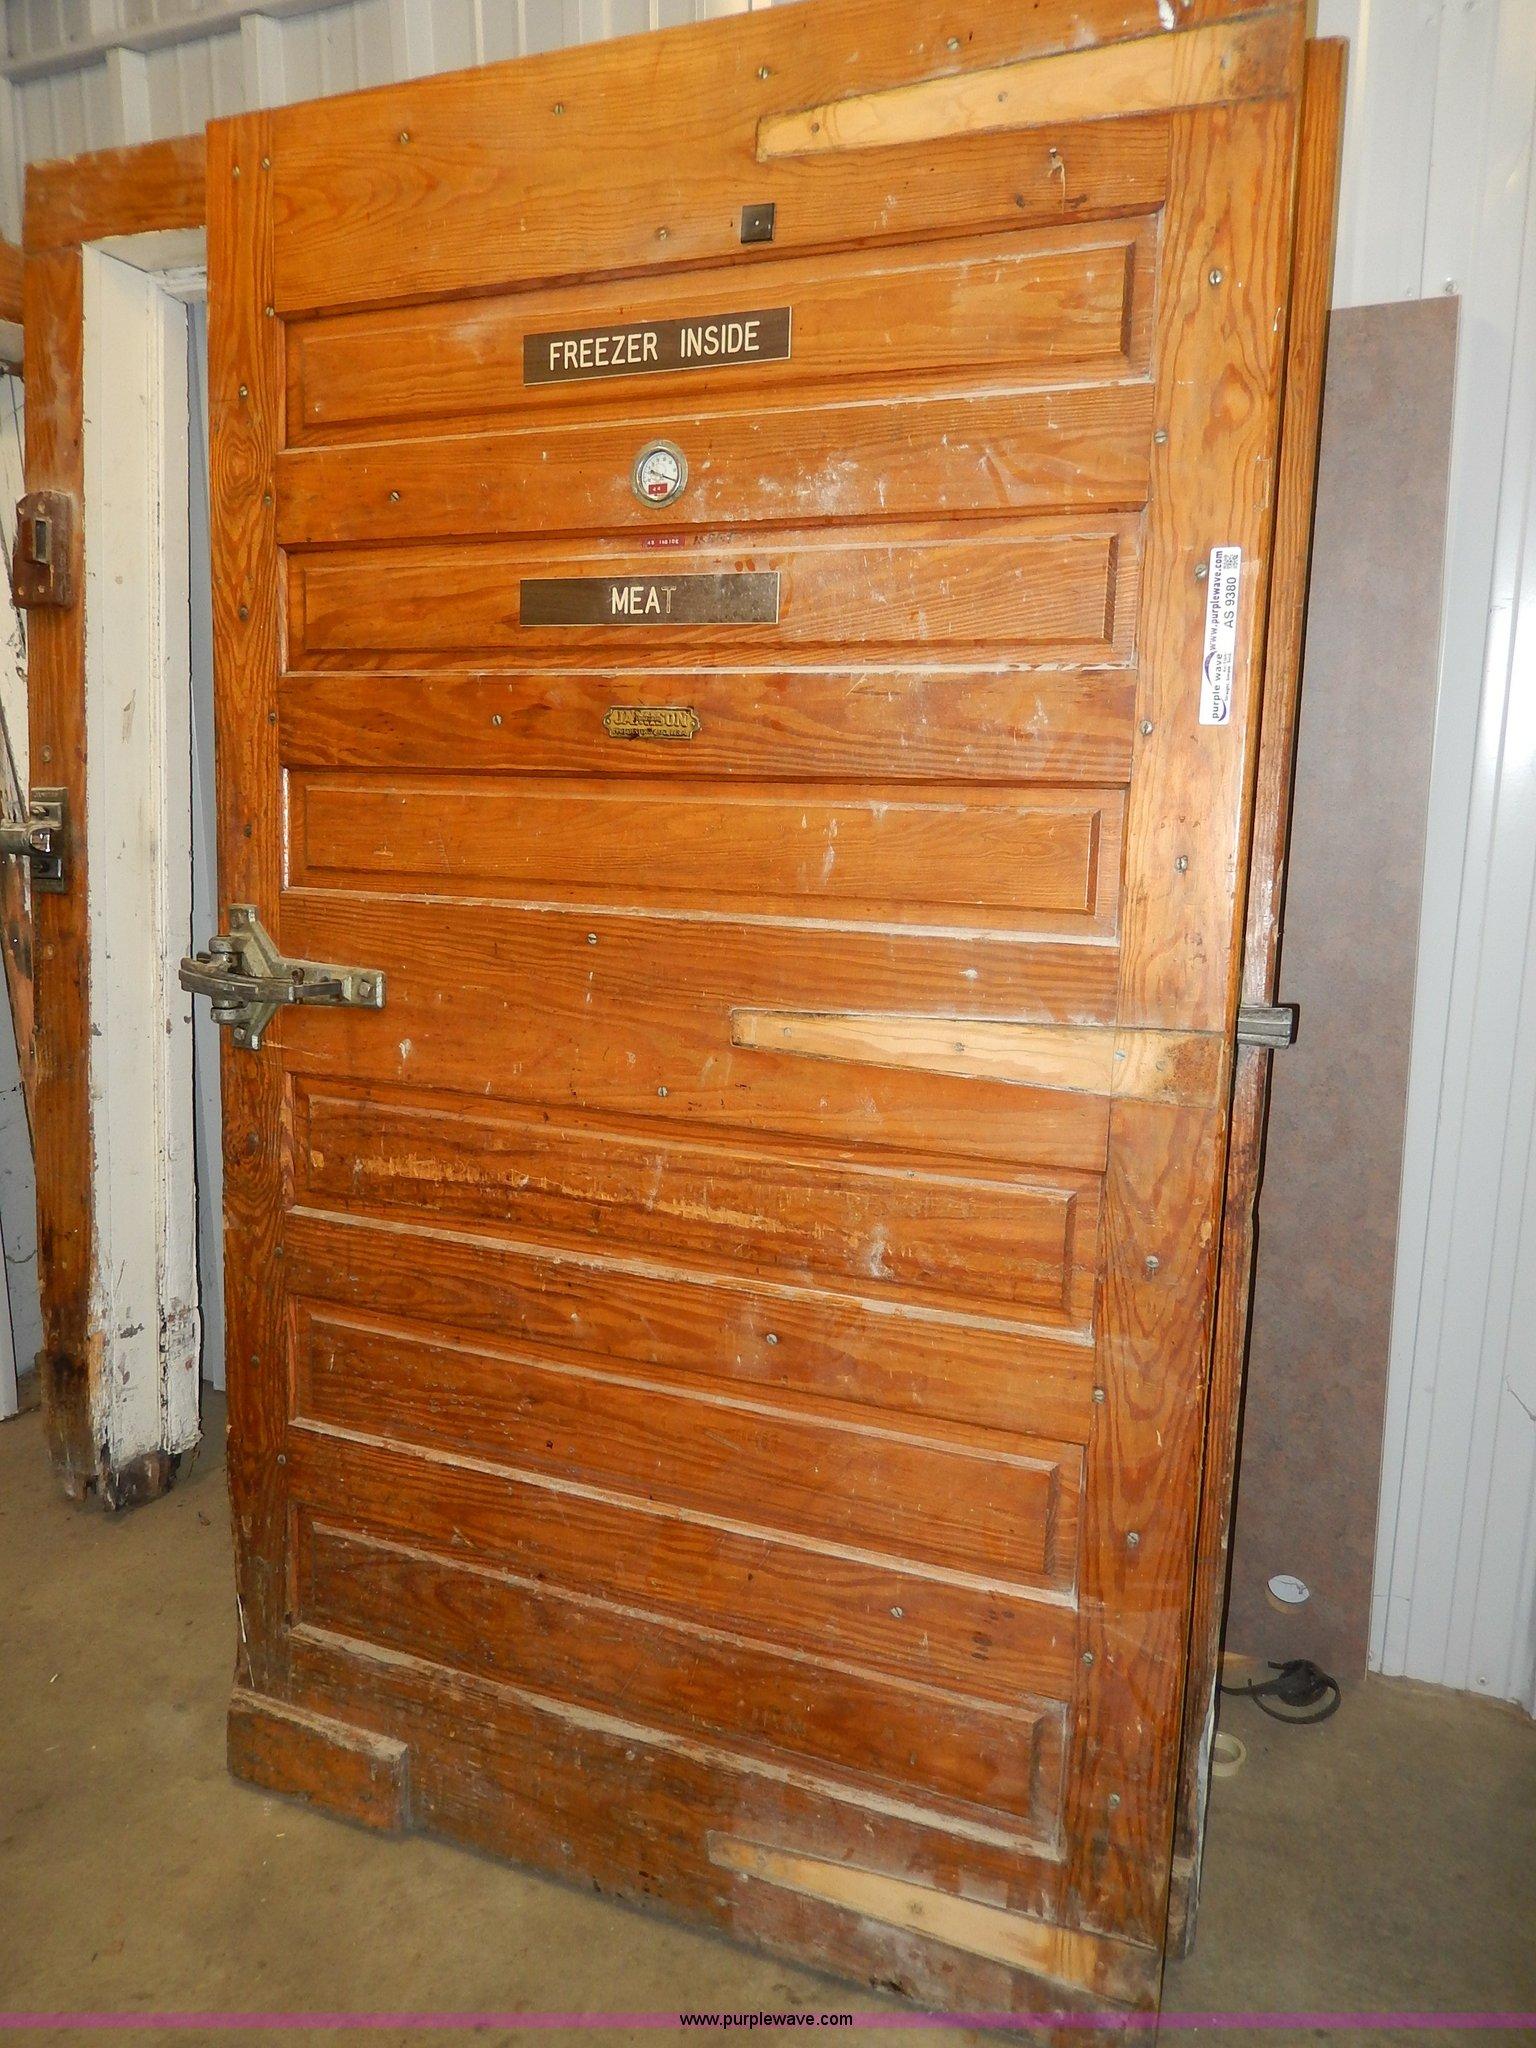 Full size in new window ... & 2) Jamison wood walk-in freezer doors and jams | Item AS938...